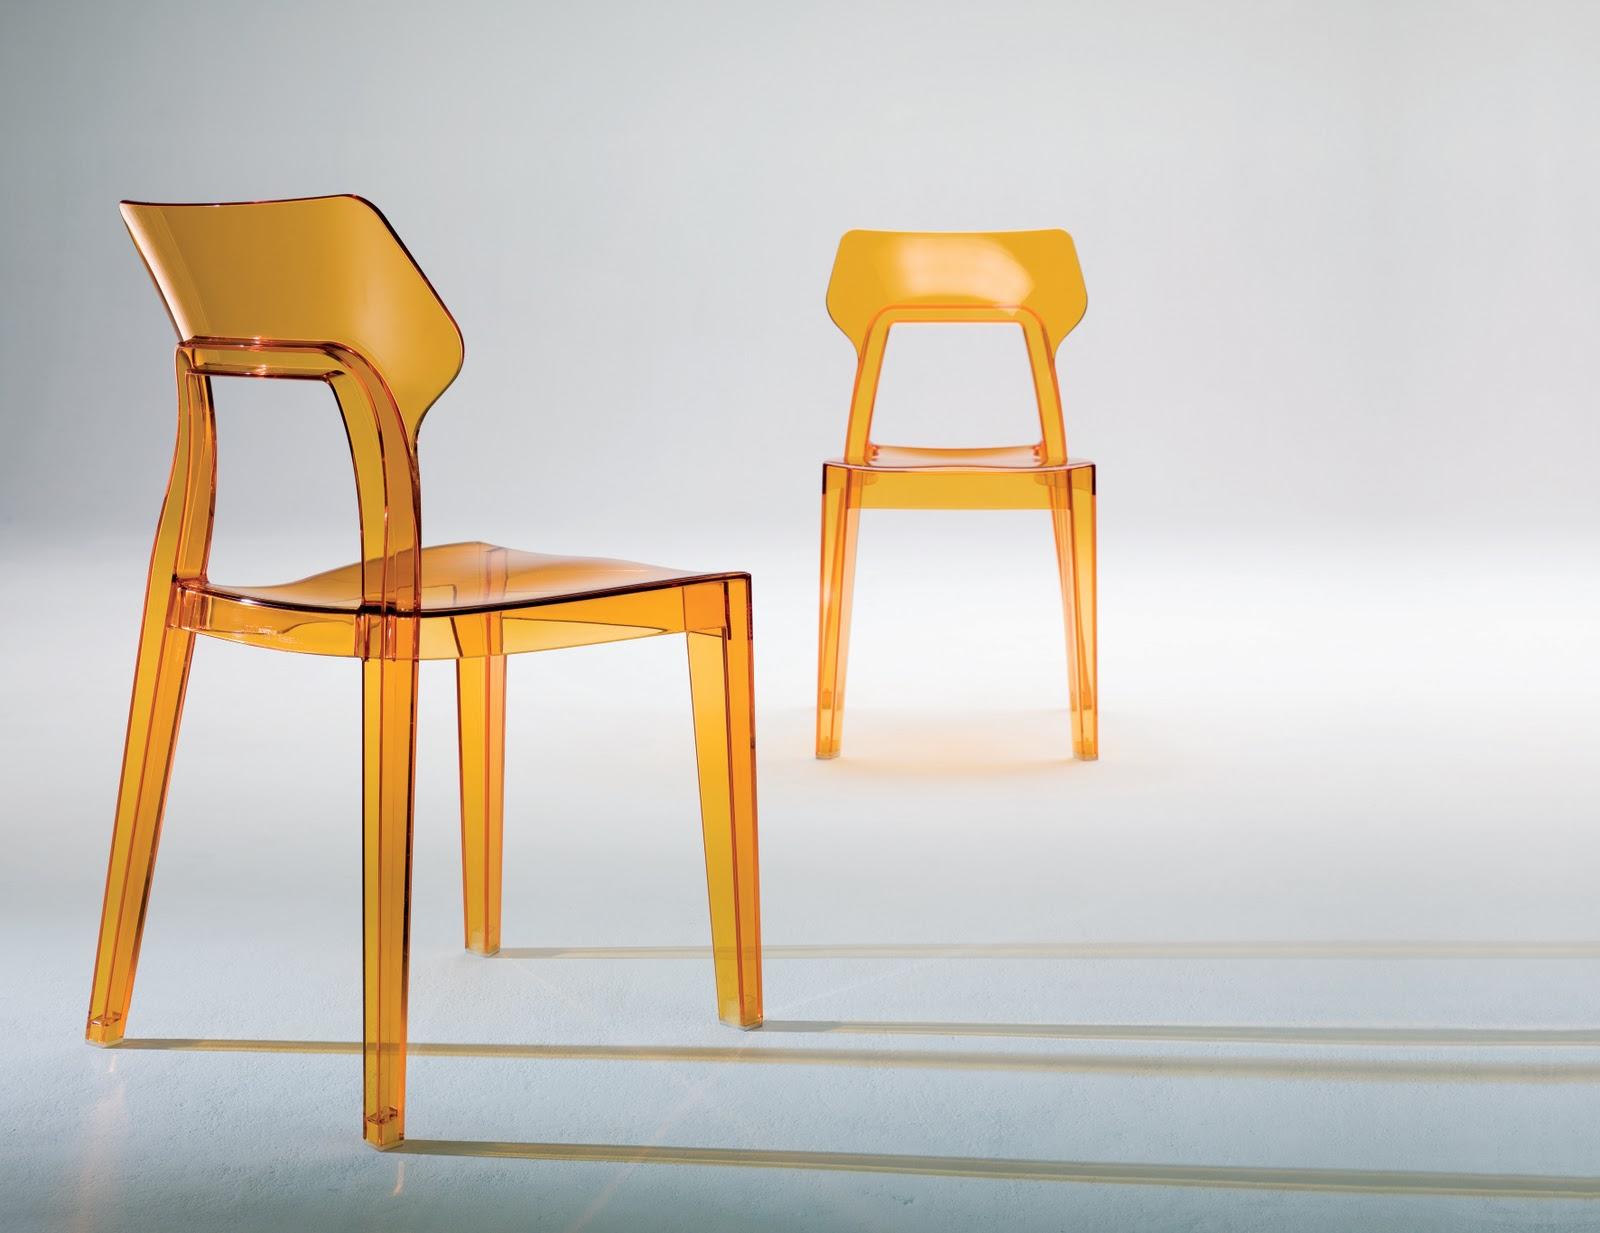 Orange dining chairs -  Dining Chair Orange Wednesday 3 November